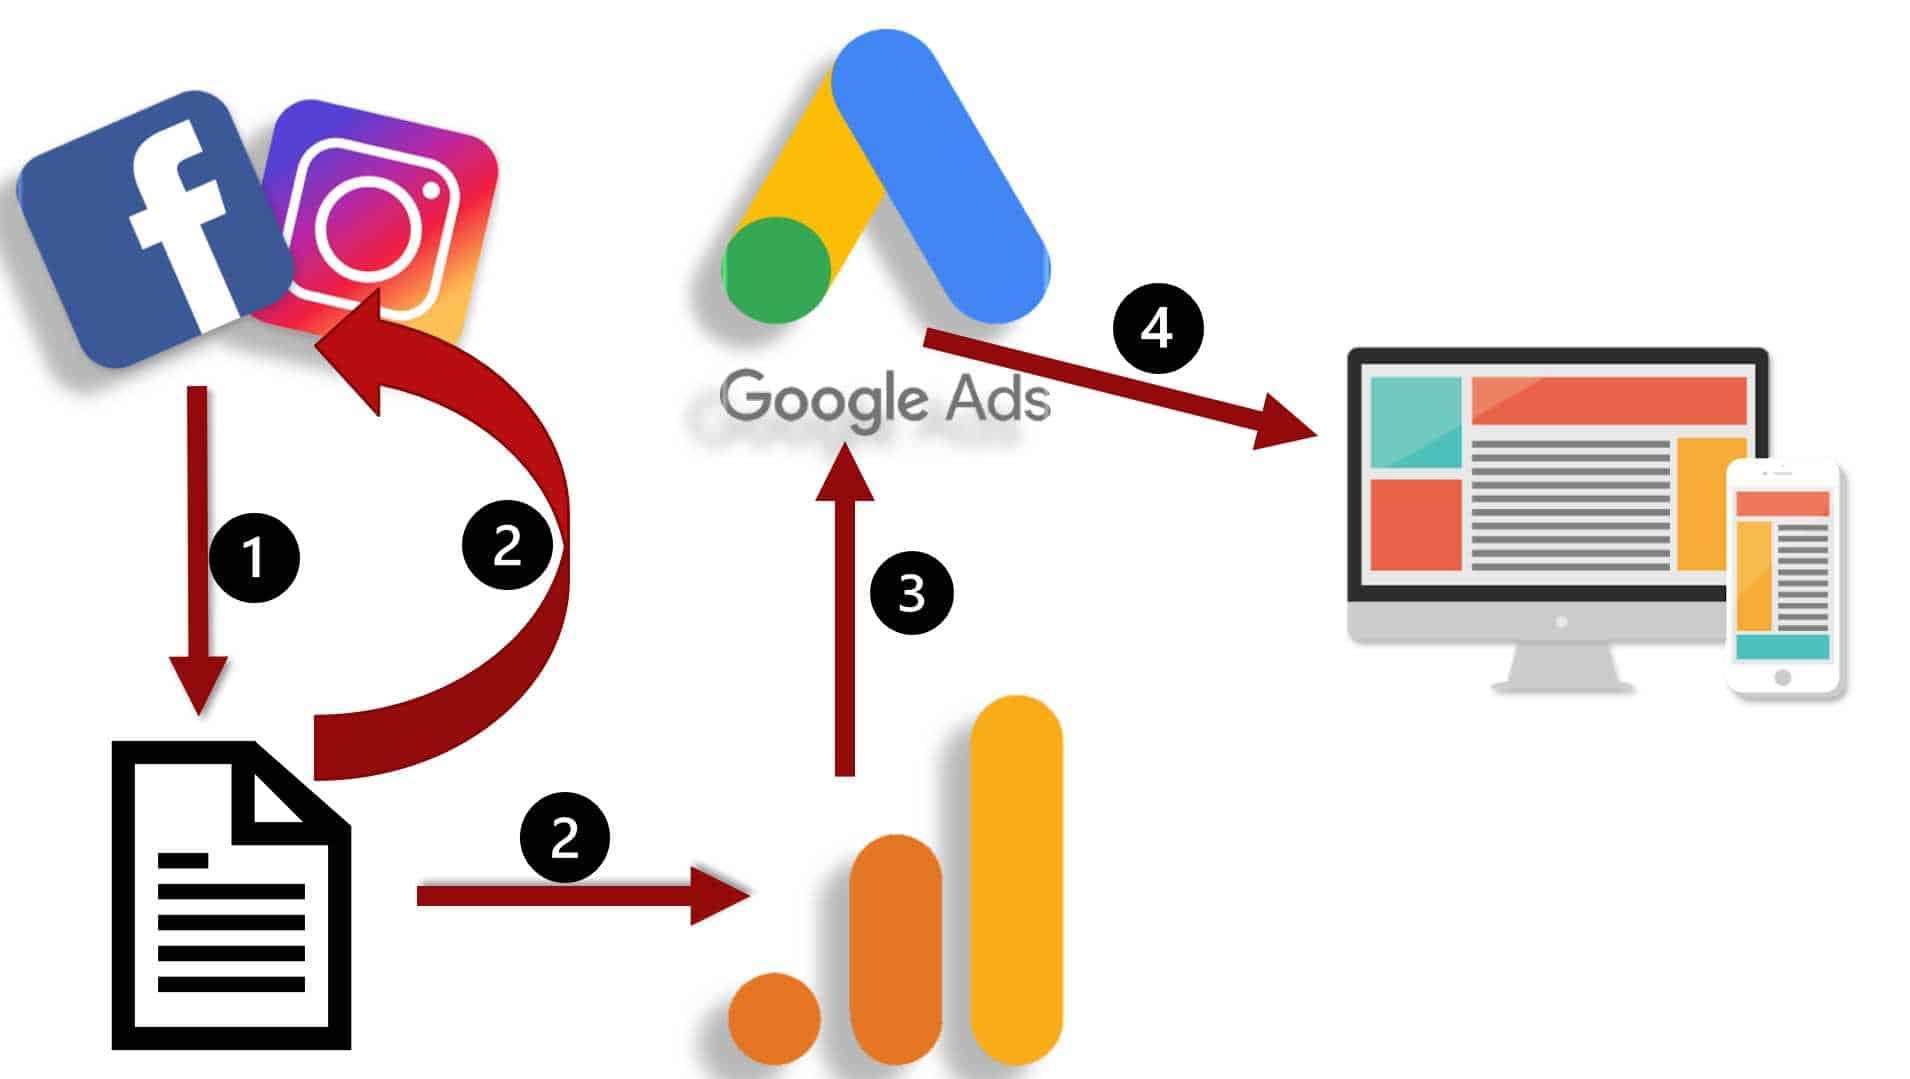 Remarketing do Google no Facebook e Remarketing do Facebook no Google